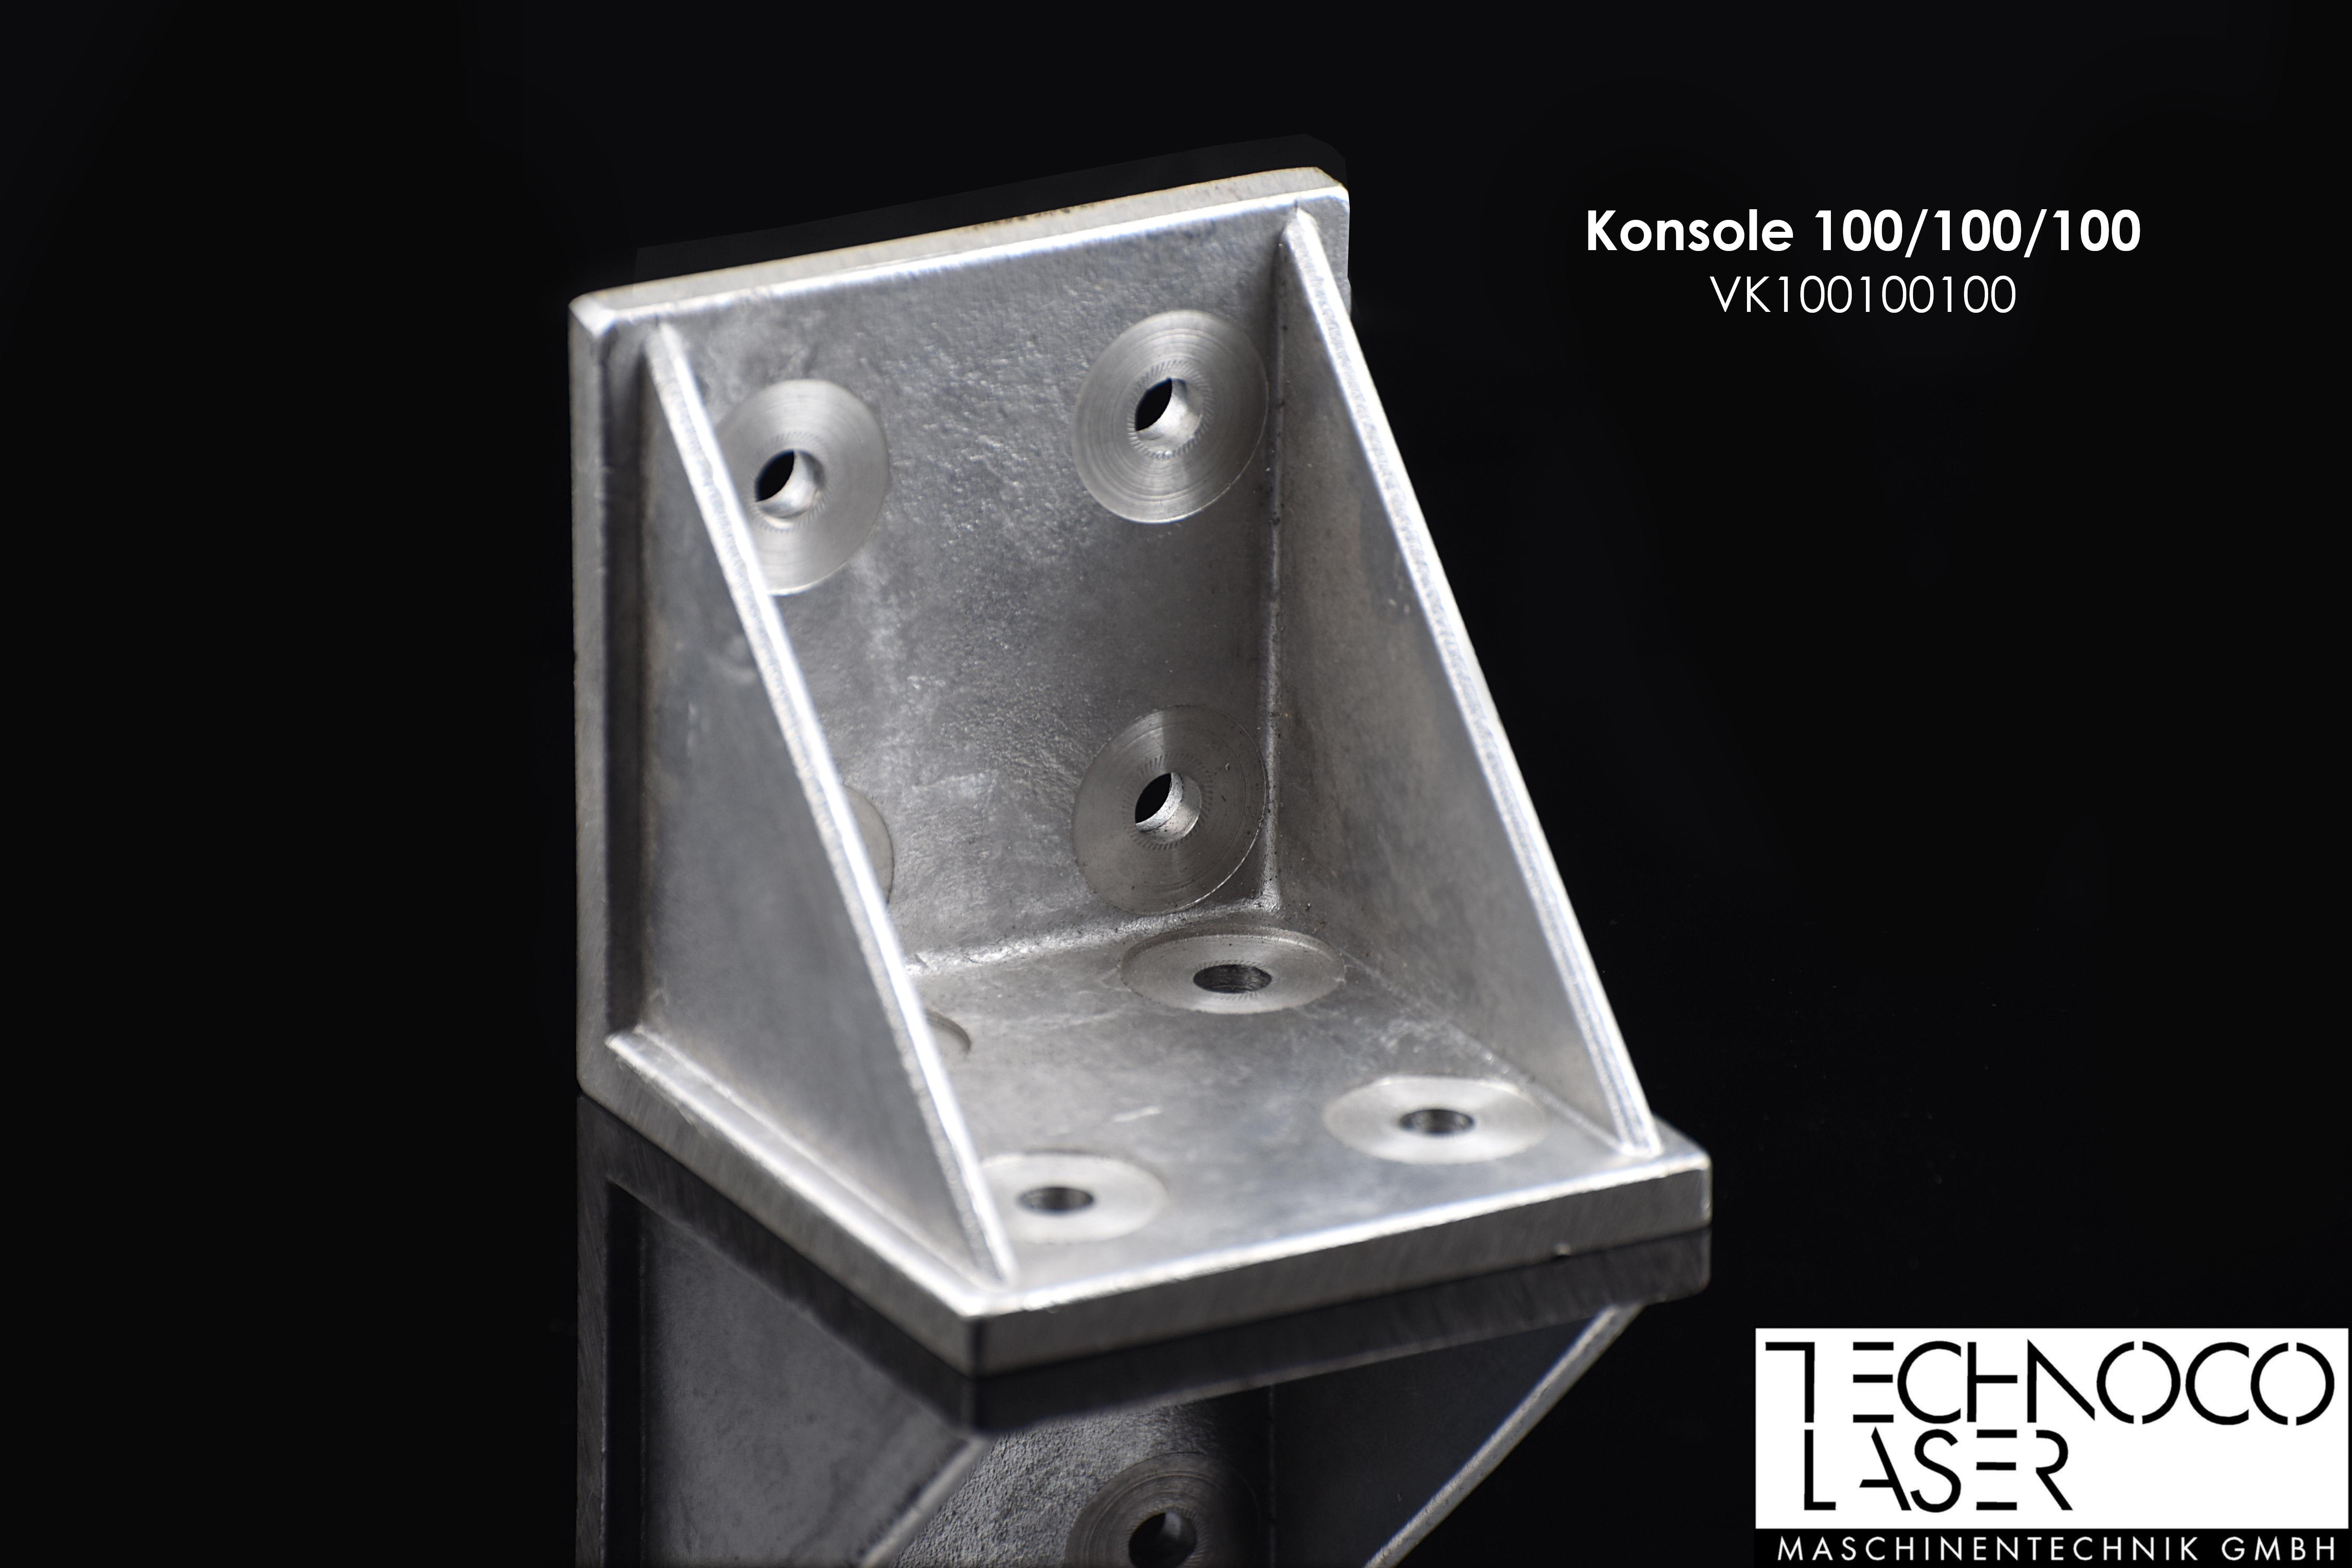 TECO Zubehör I Konsole 100/100/100